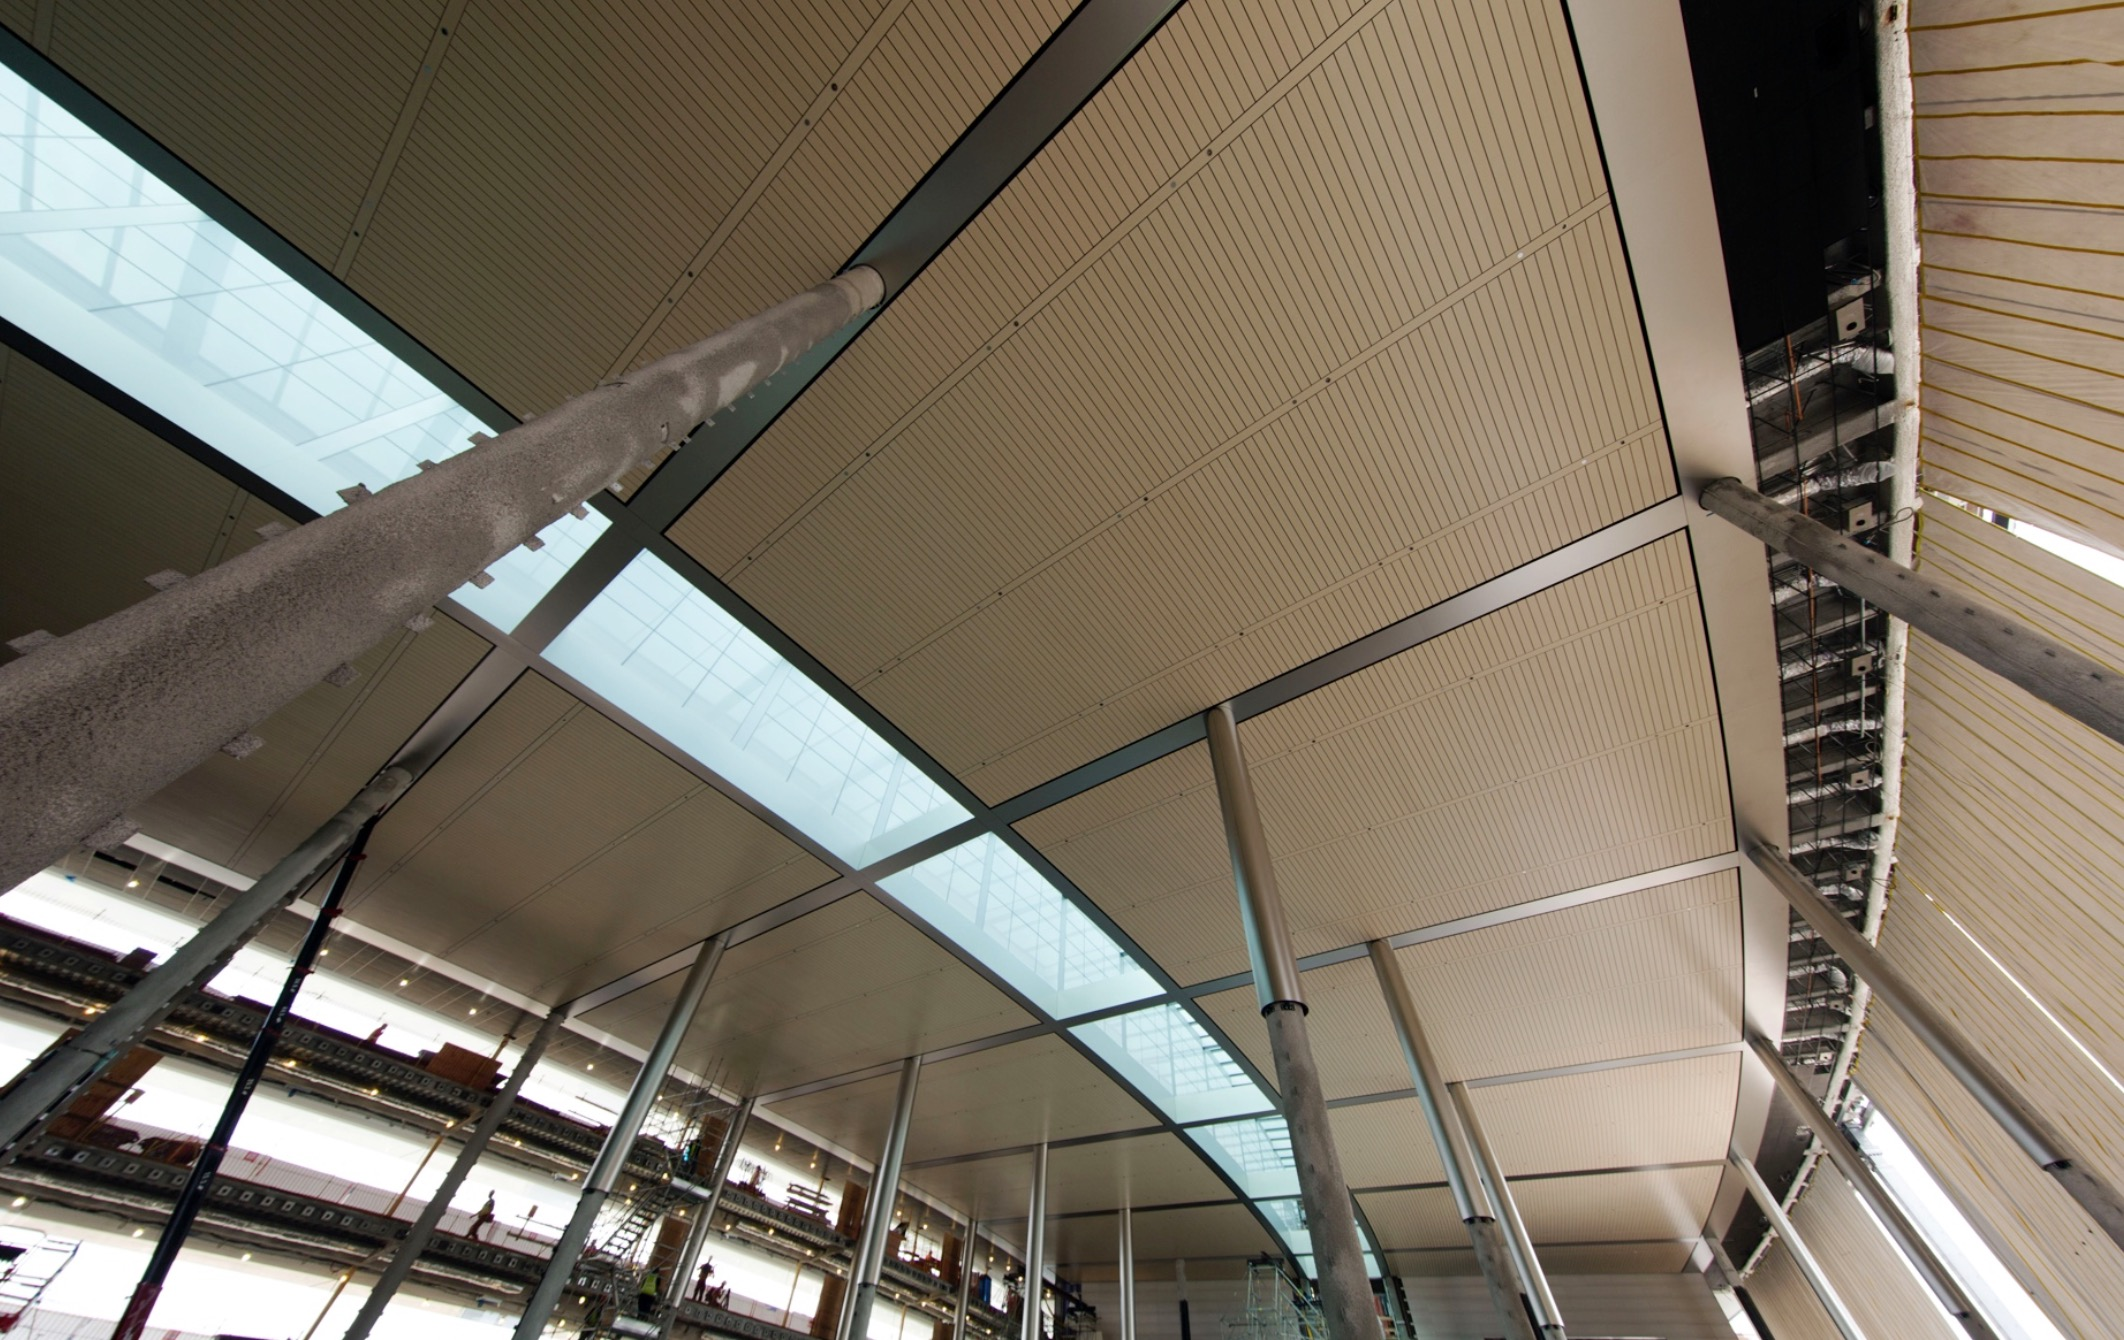 iSpaceship interior image 007